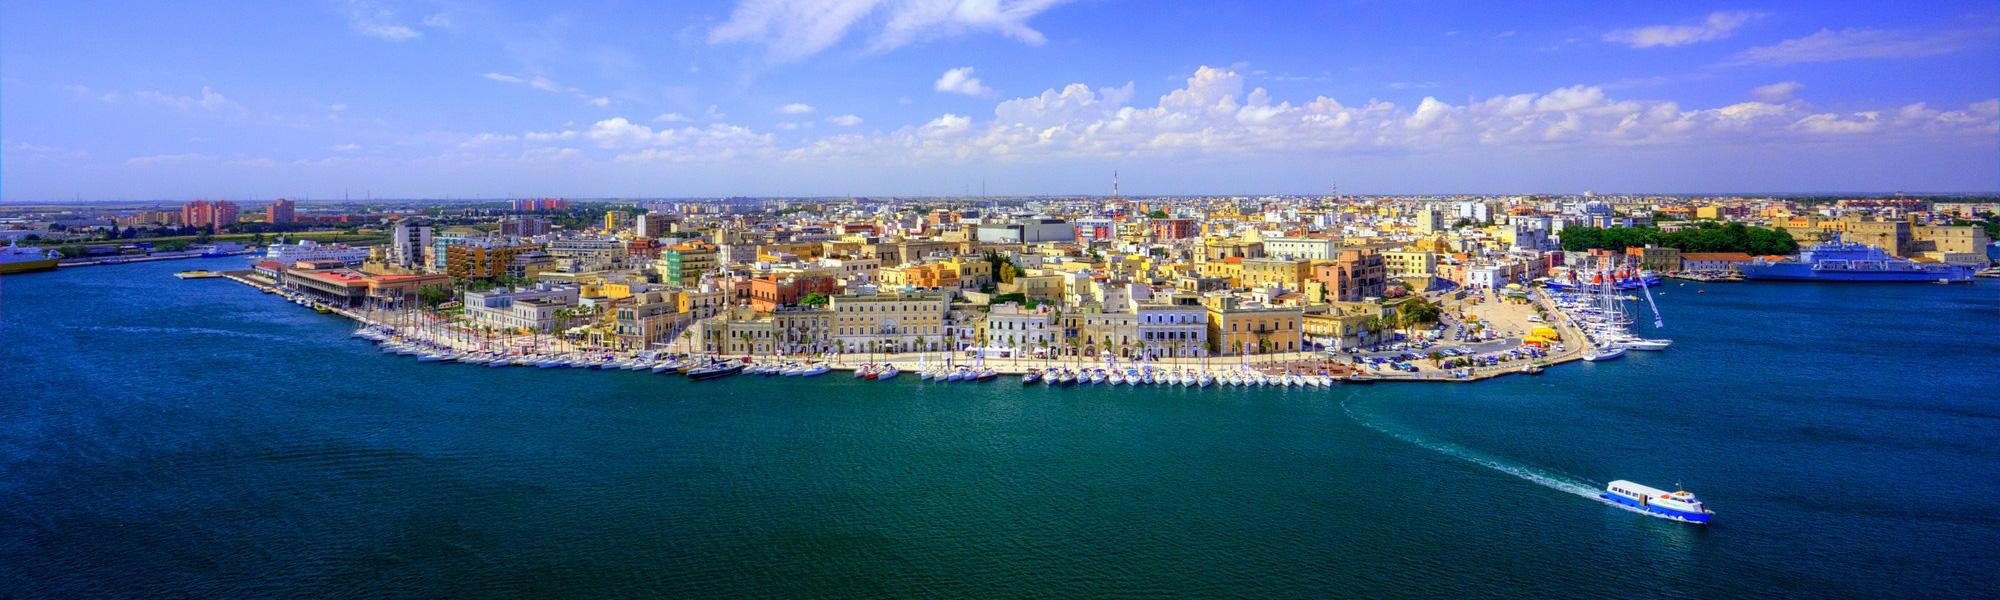 brindisi on the adriatic sea